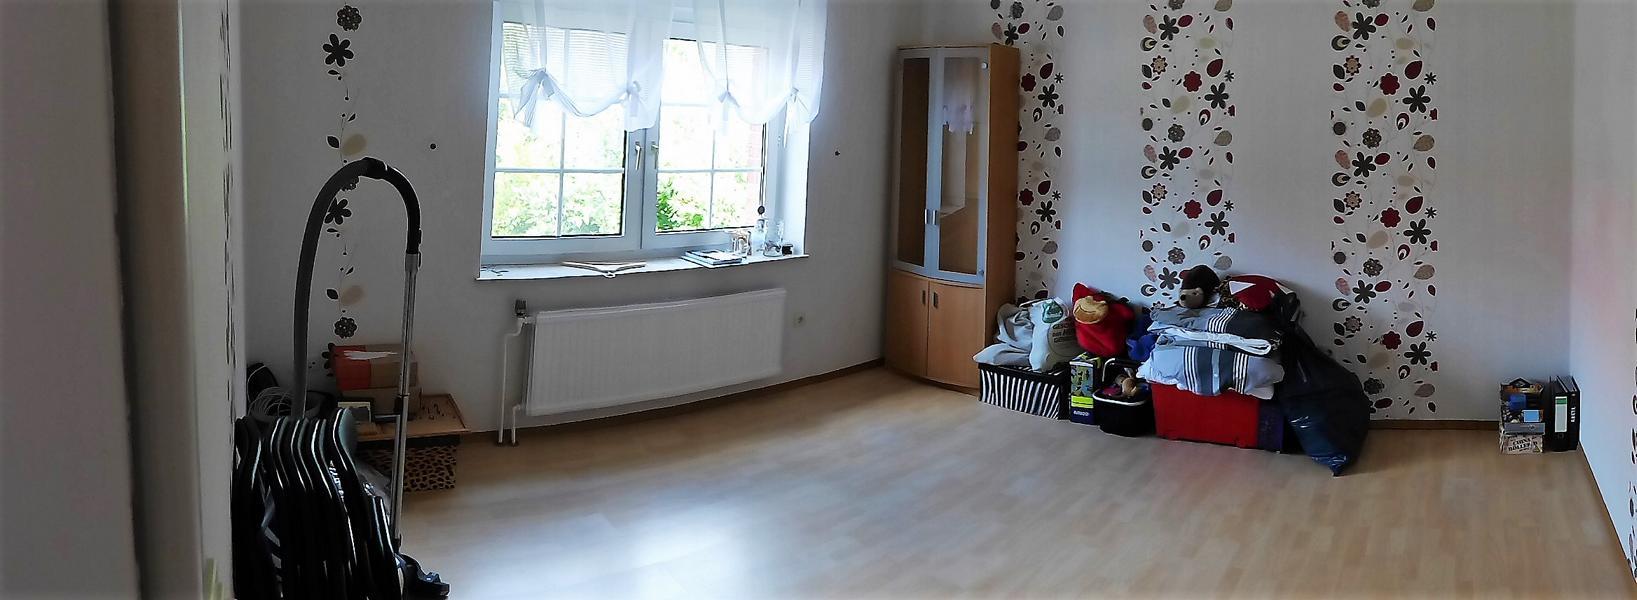 K800_Kinderzimmer_1